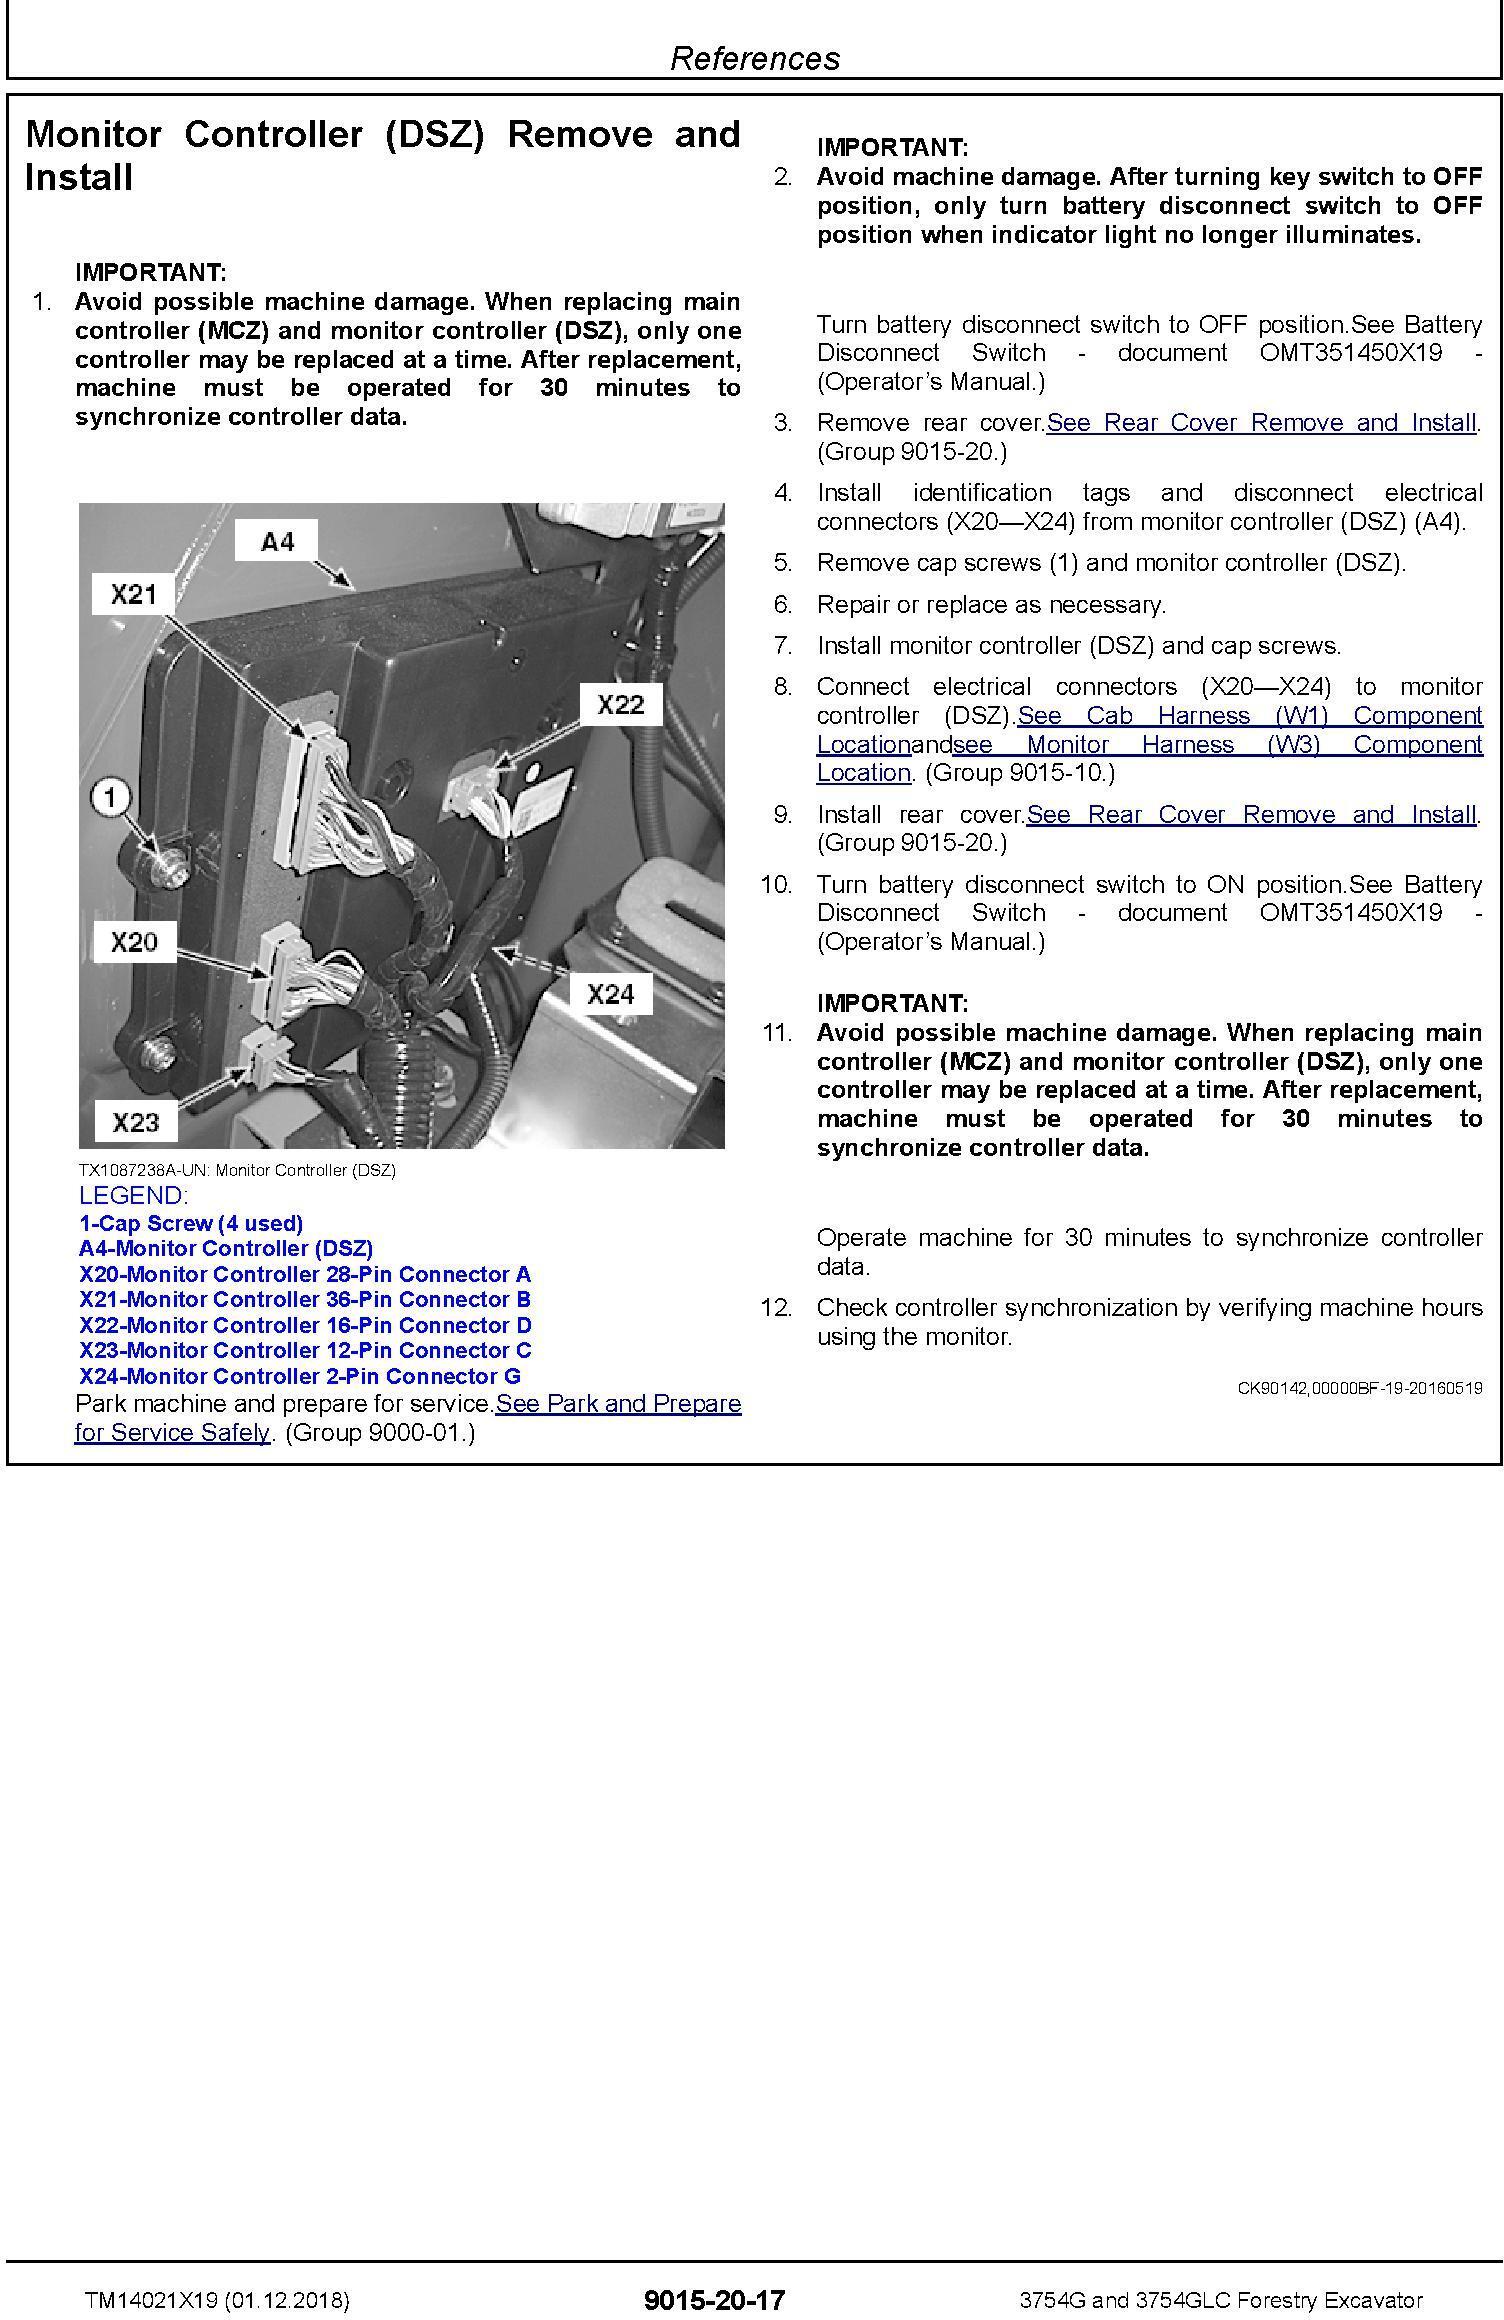 John Deere 3754G, 3754GLC (SN. F371001-) Forestry Excavator Diagnostic Technical Manual (TM14021X19) - 2